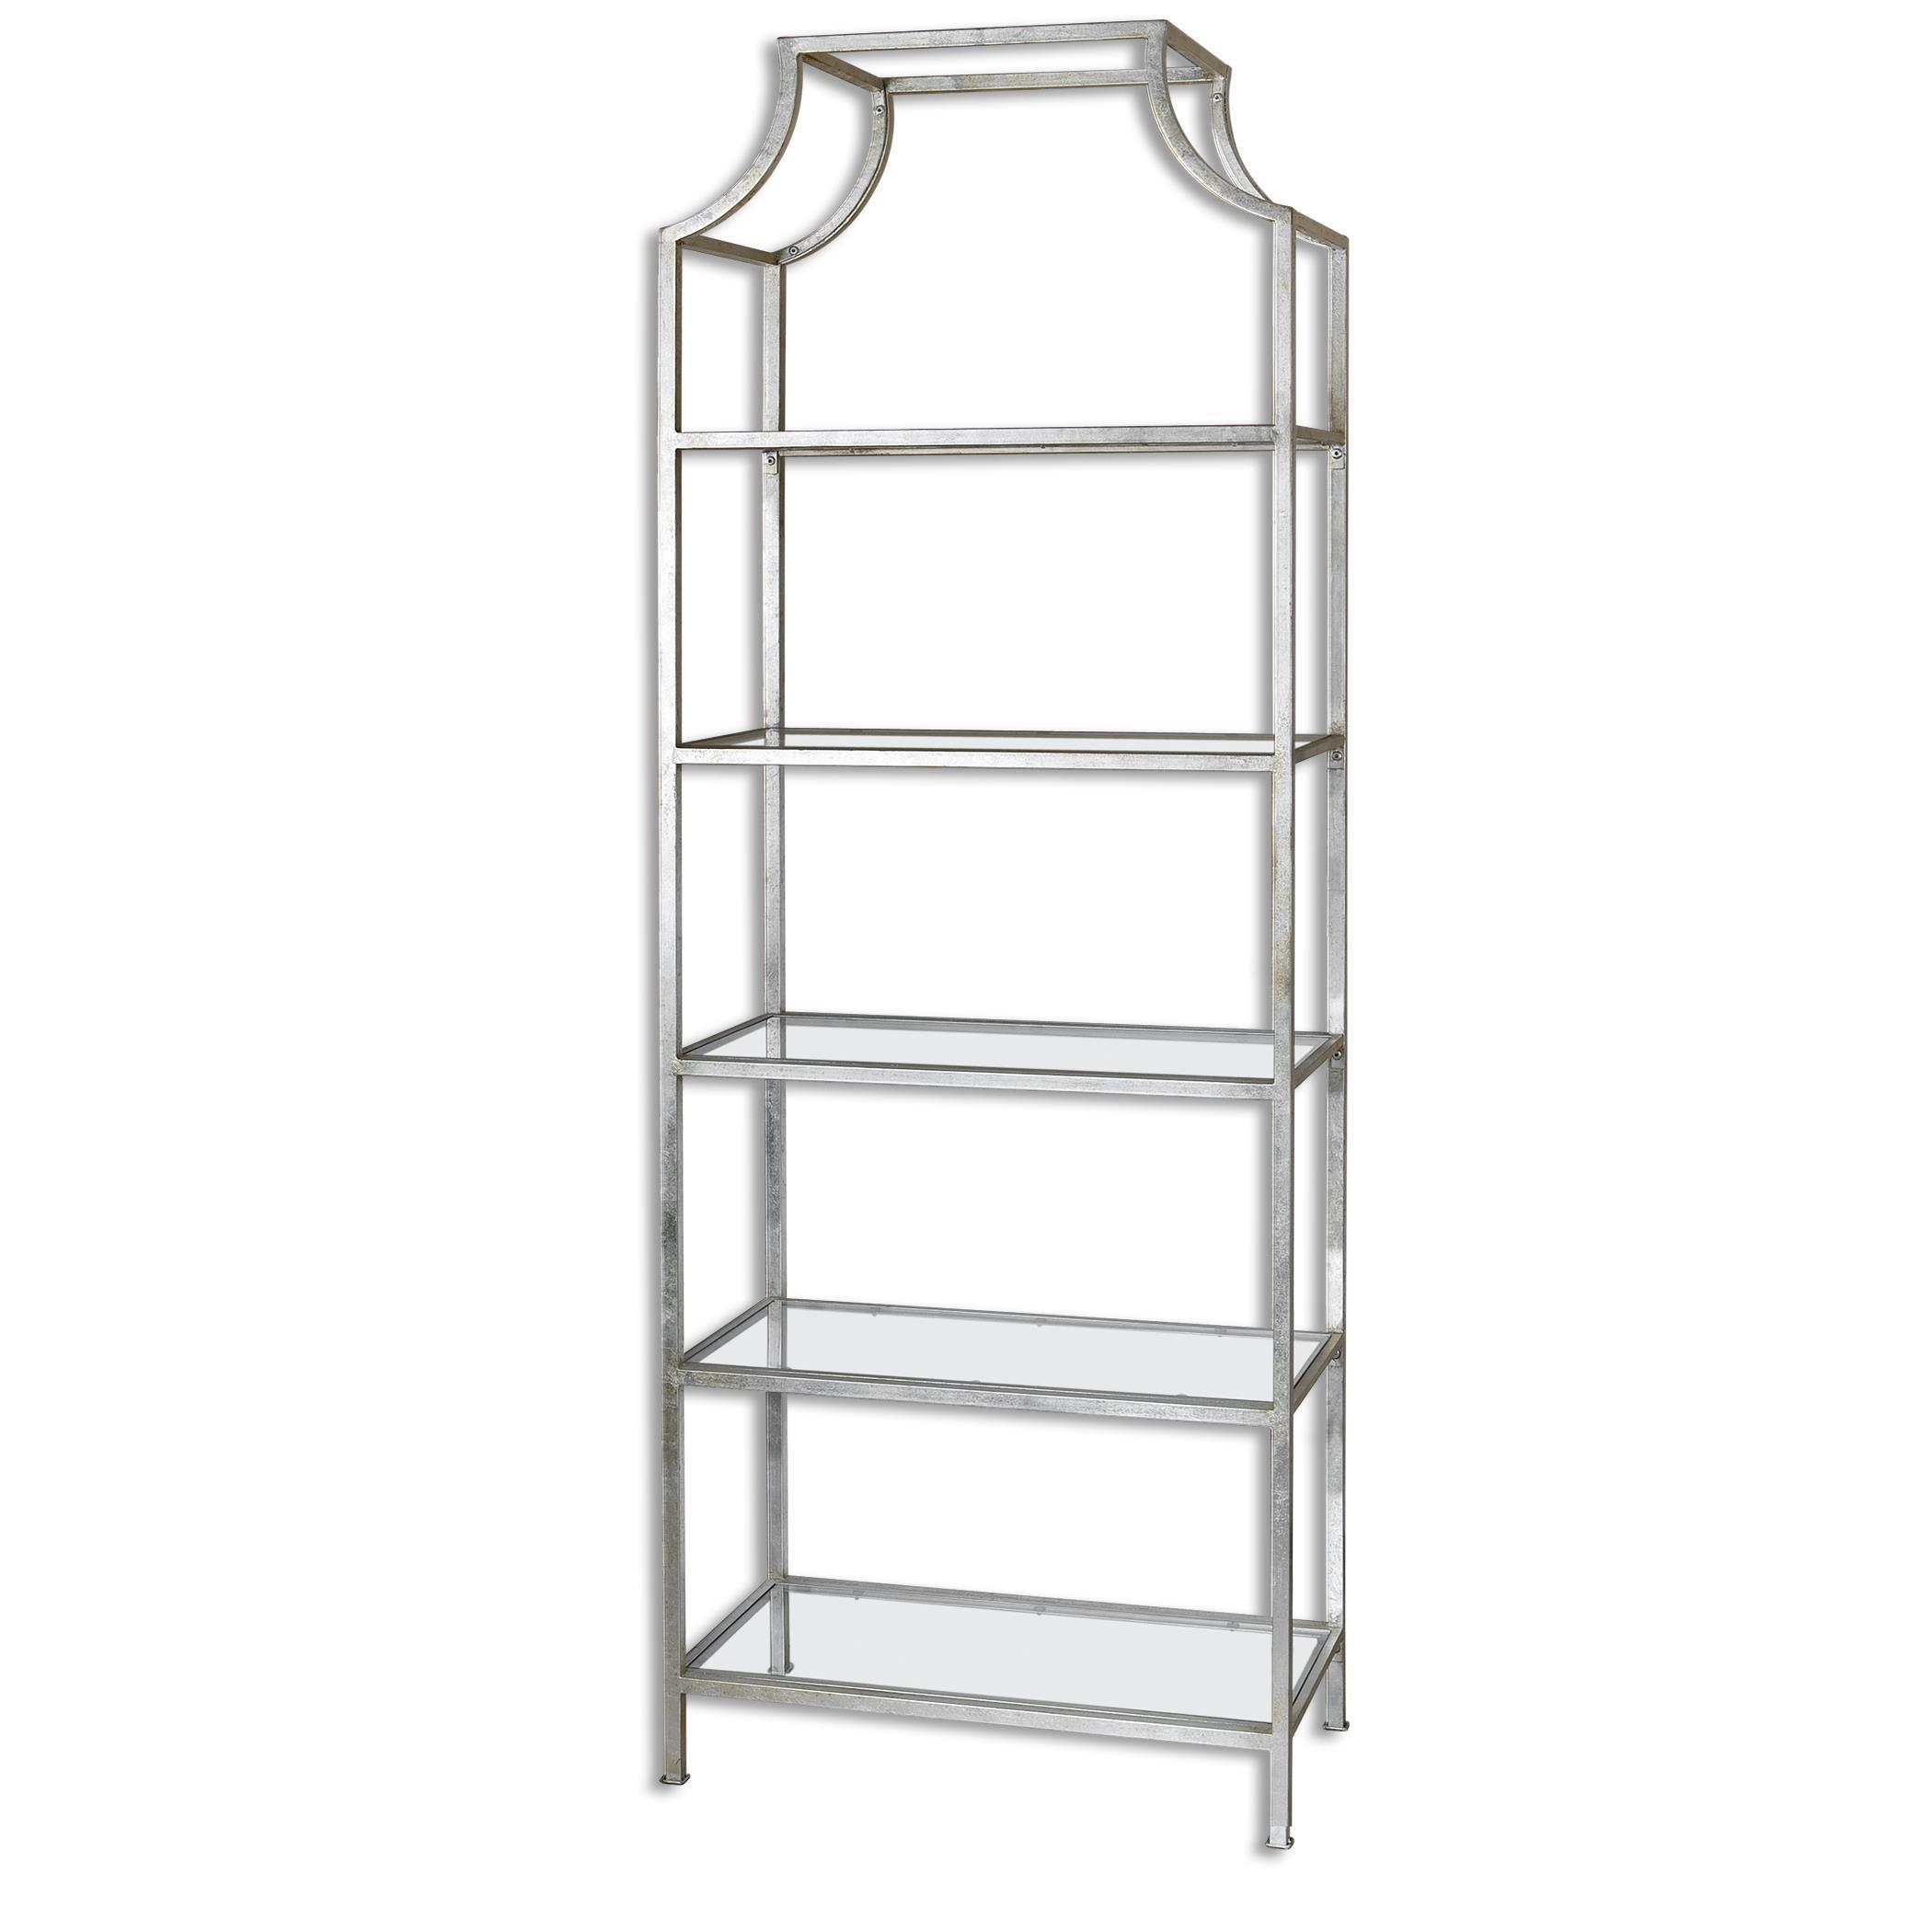 Uttermost Accent Furniture Aurelie Silver Etagere - Item Number: 24514